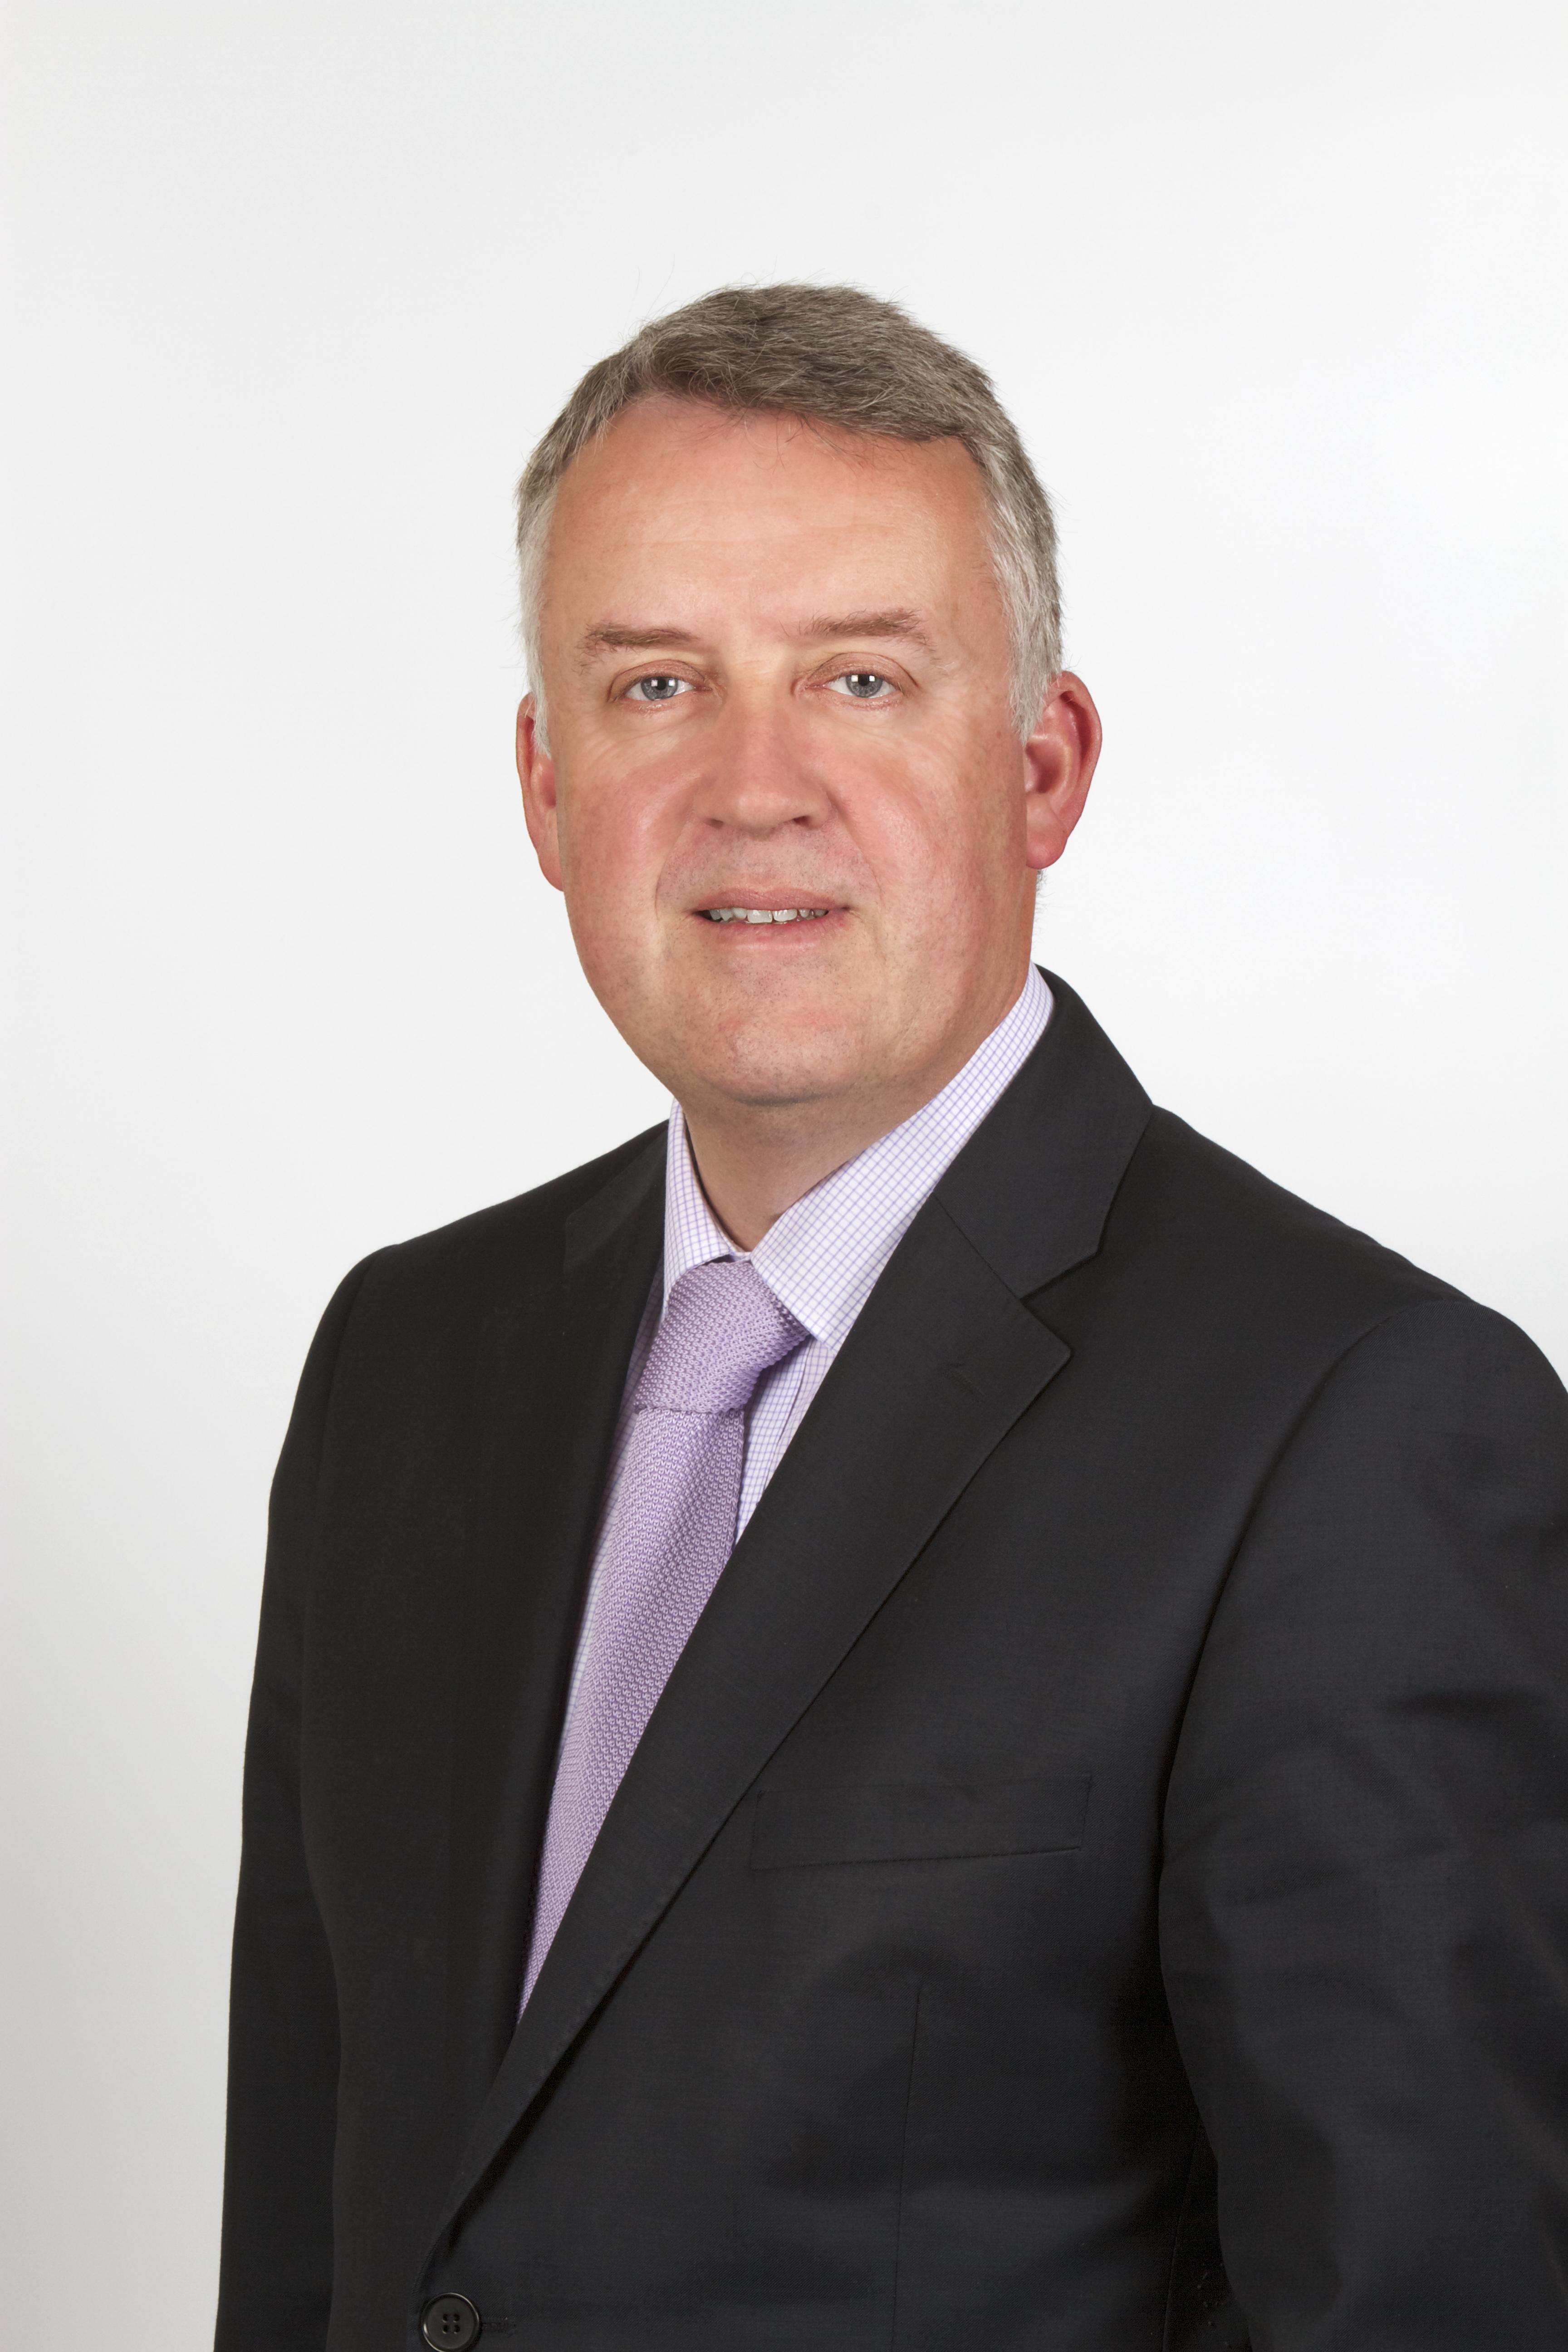 Dr. Alan Hore – Lecturer, Dublin Institute of Technology